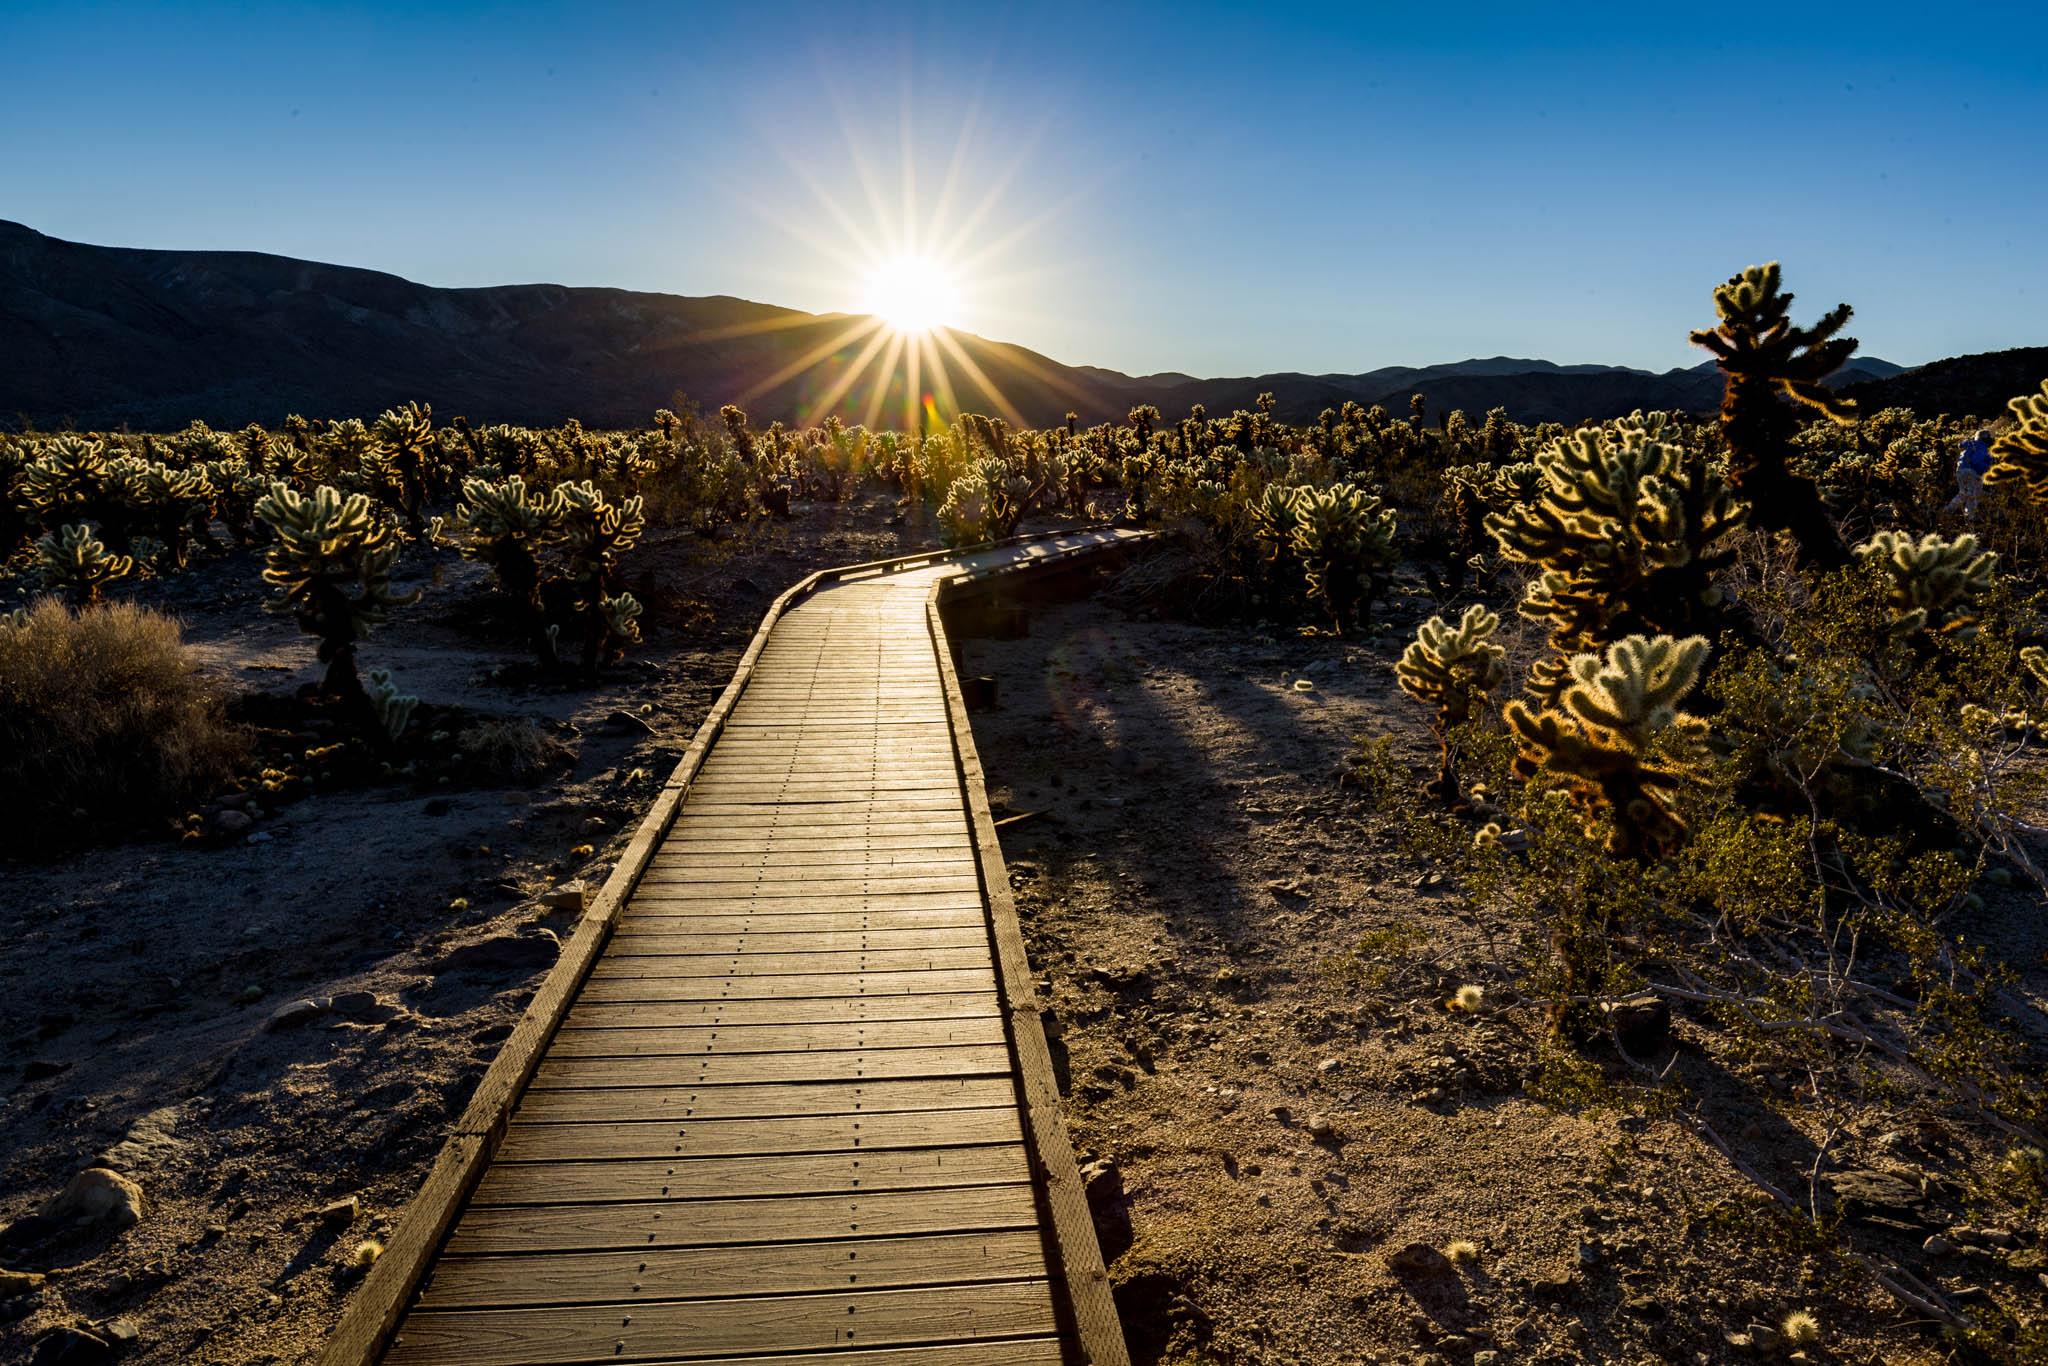 Path among the Cholla Cacti